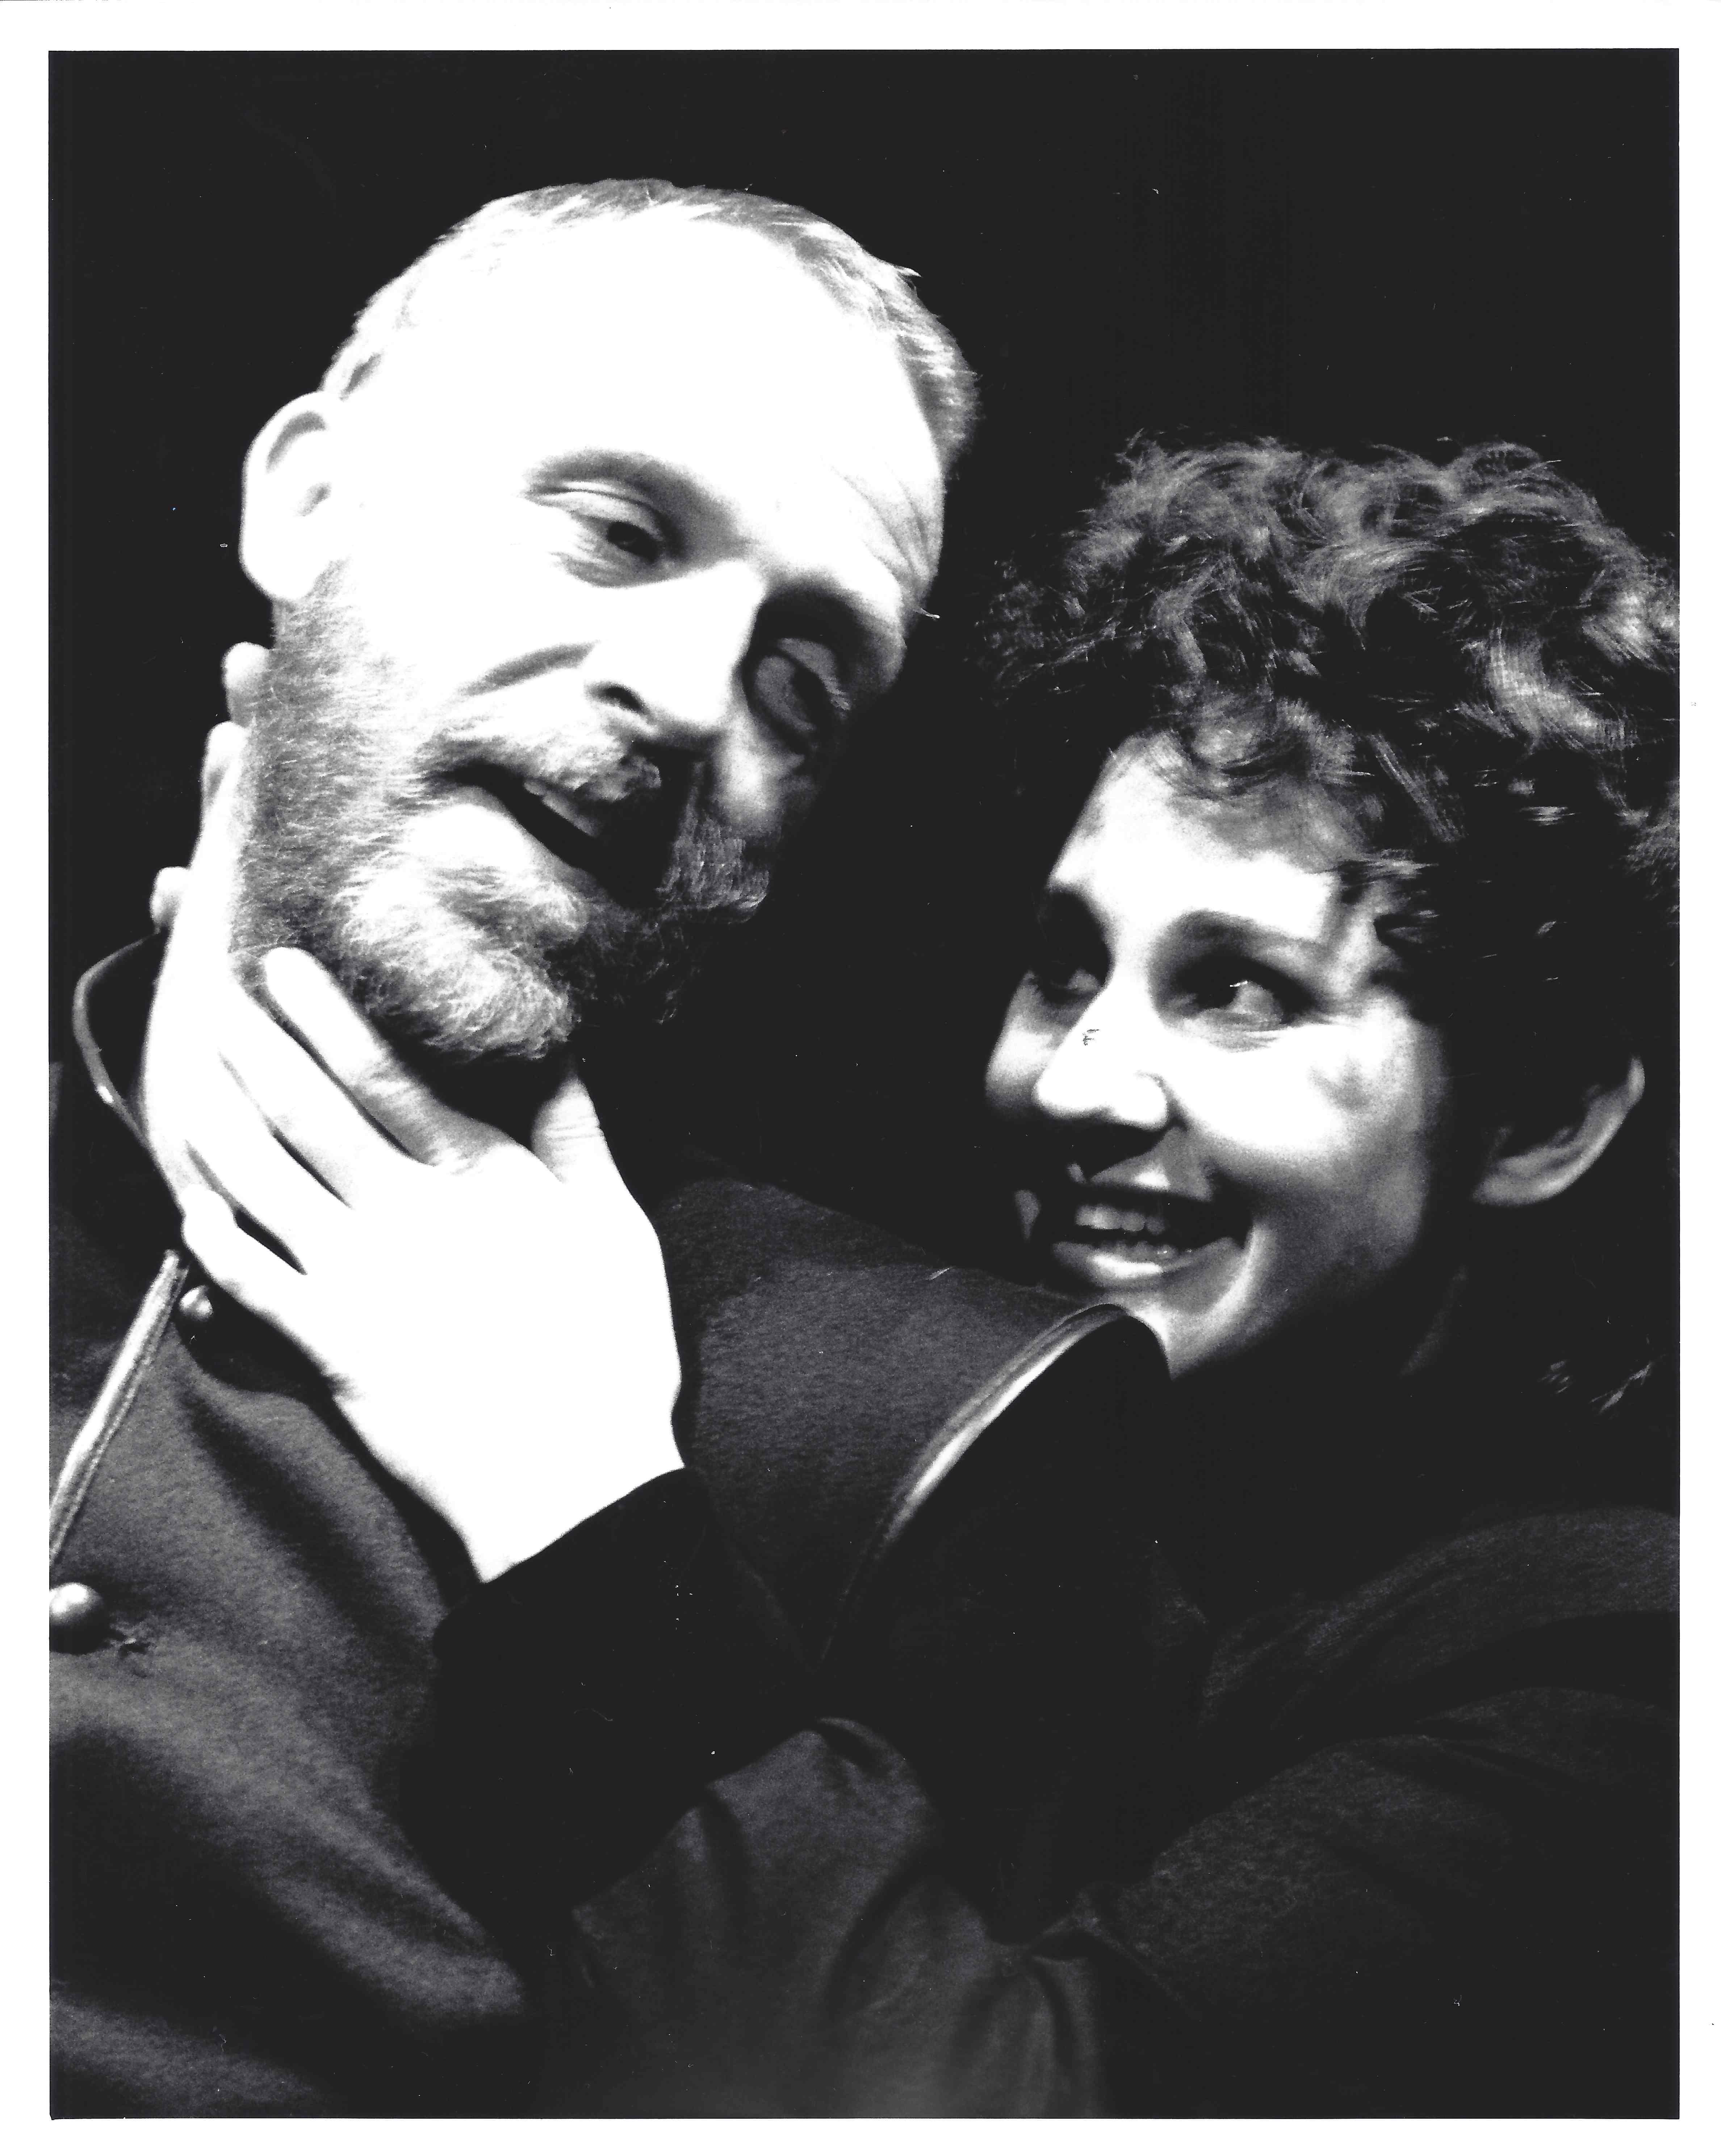 Macbeth (1987)